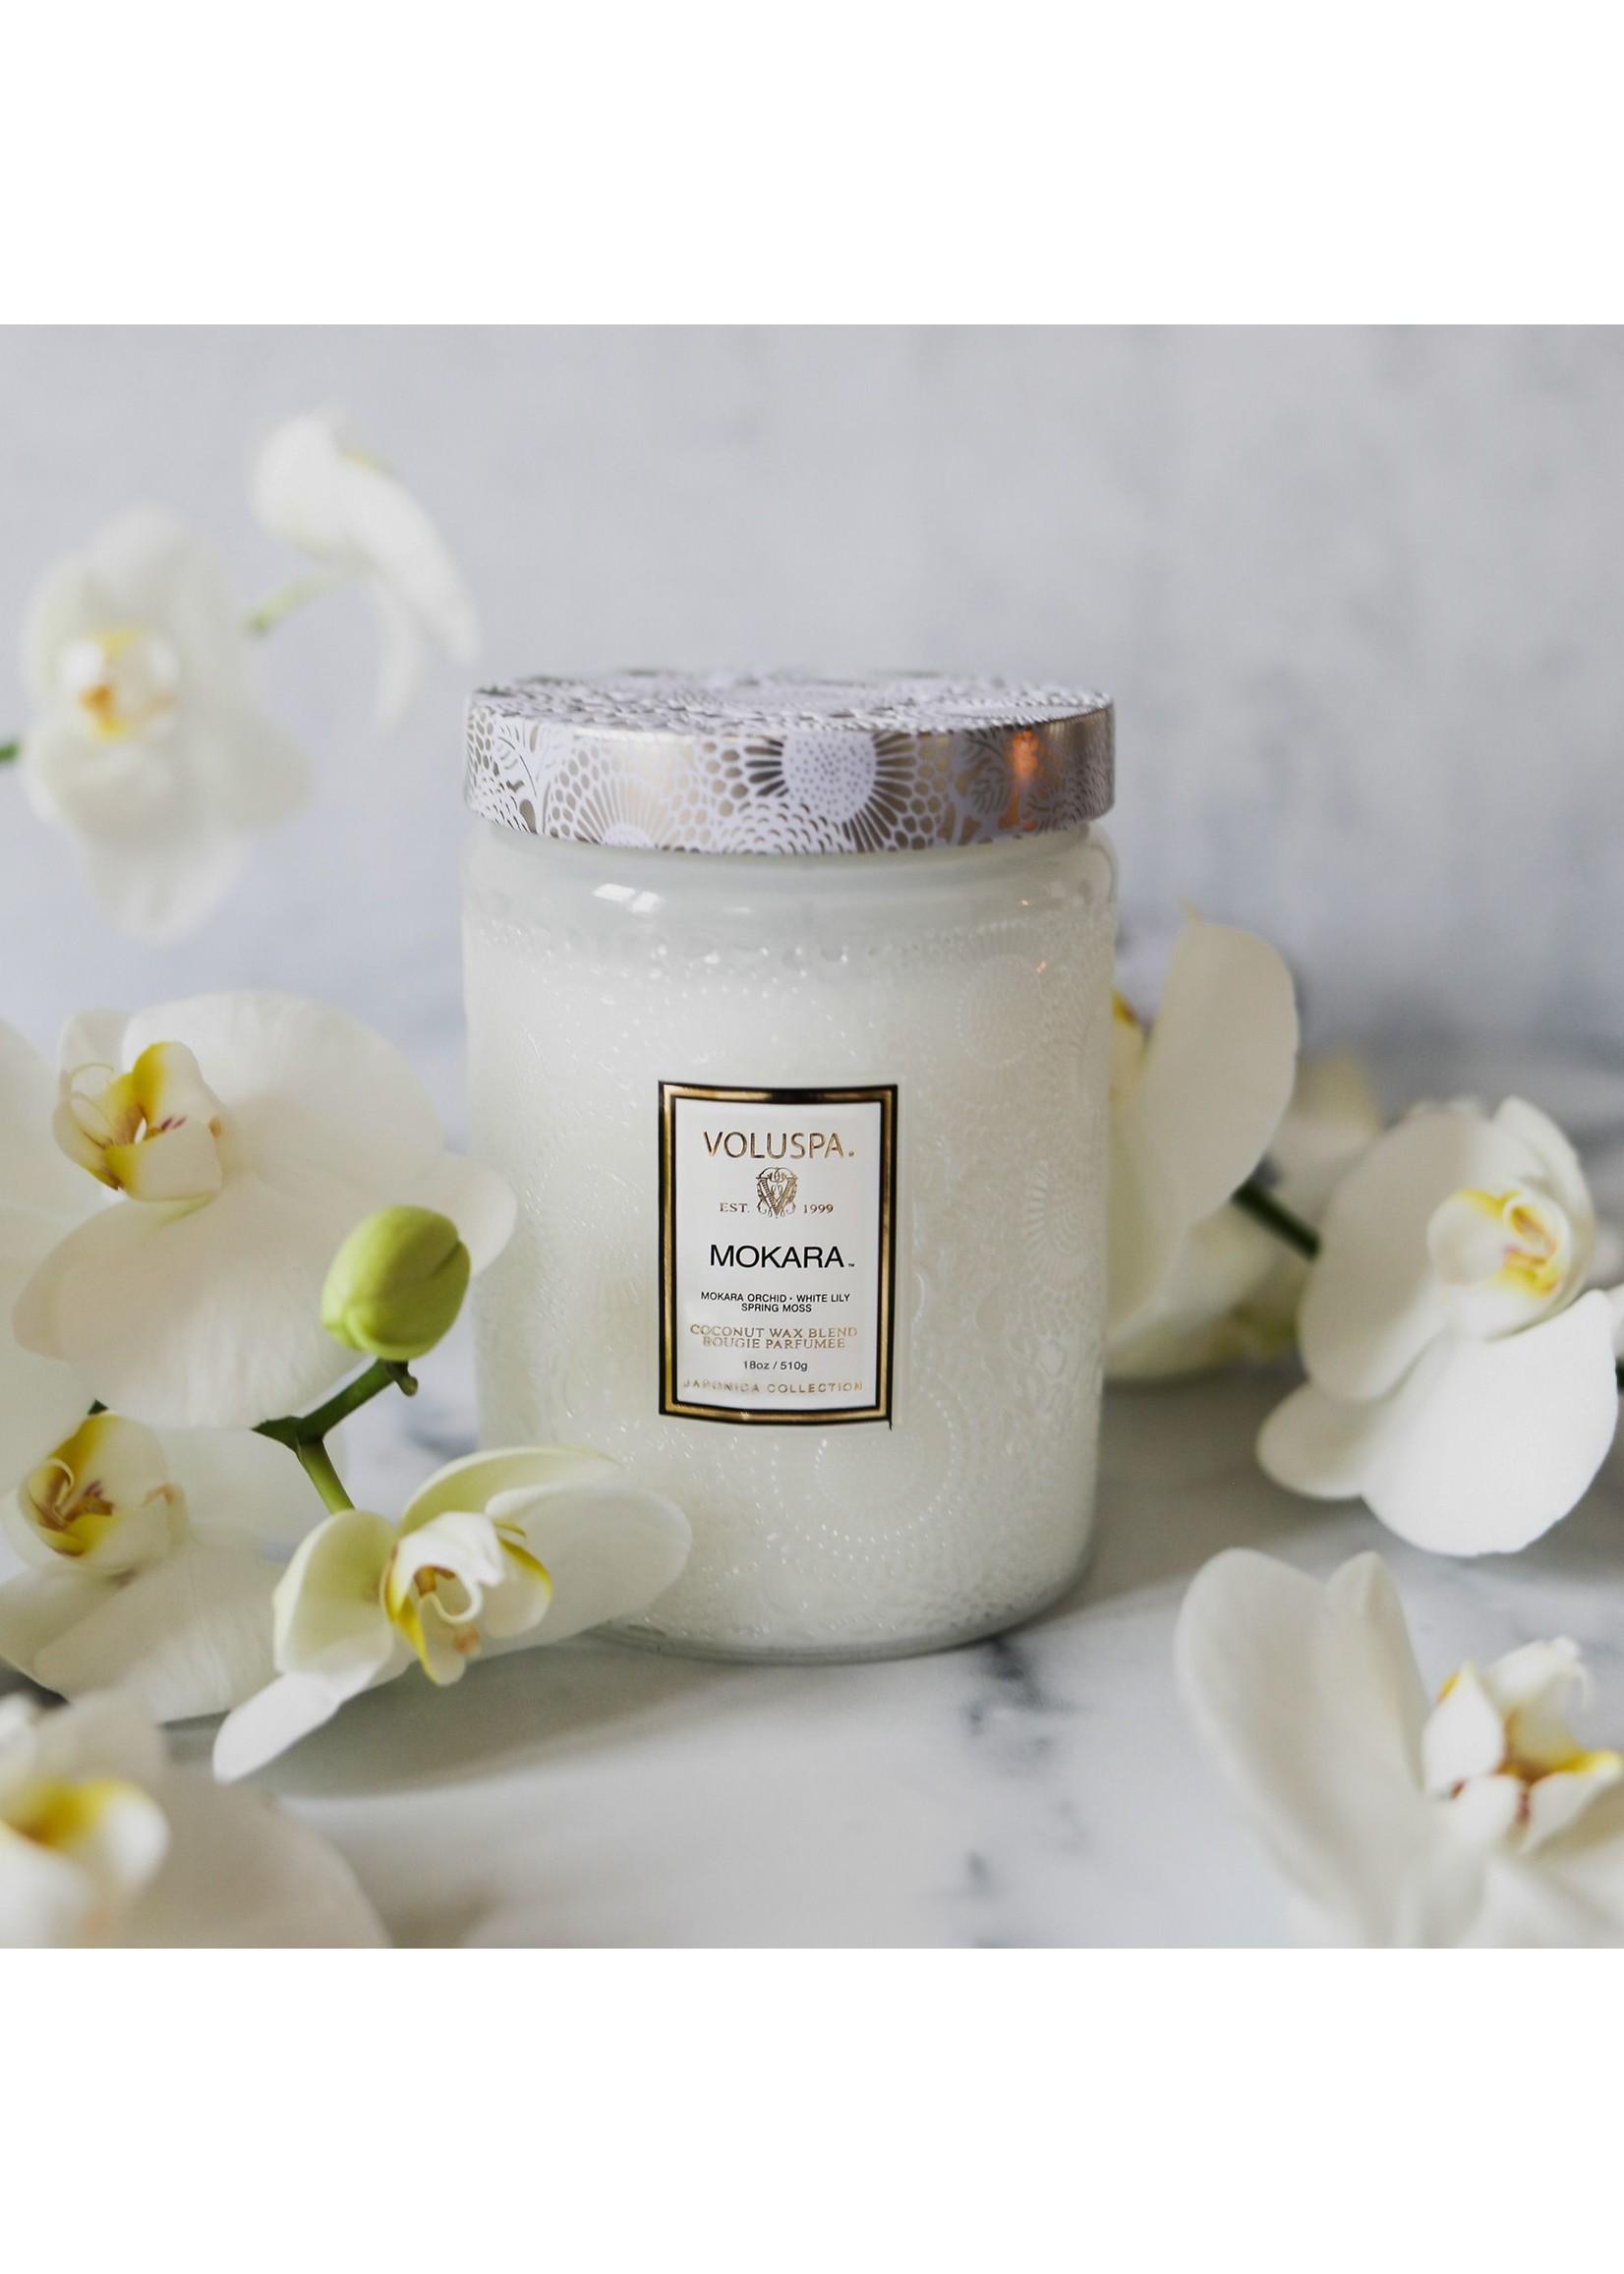 Voluspa Mokara Large Jar Candle